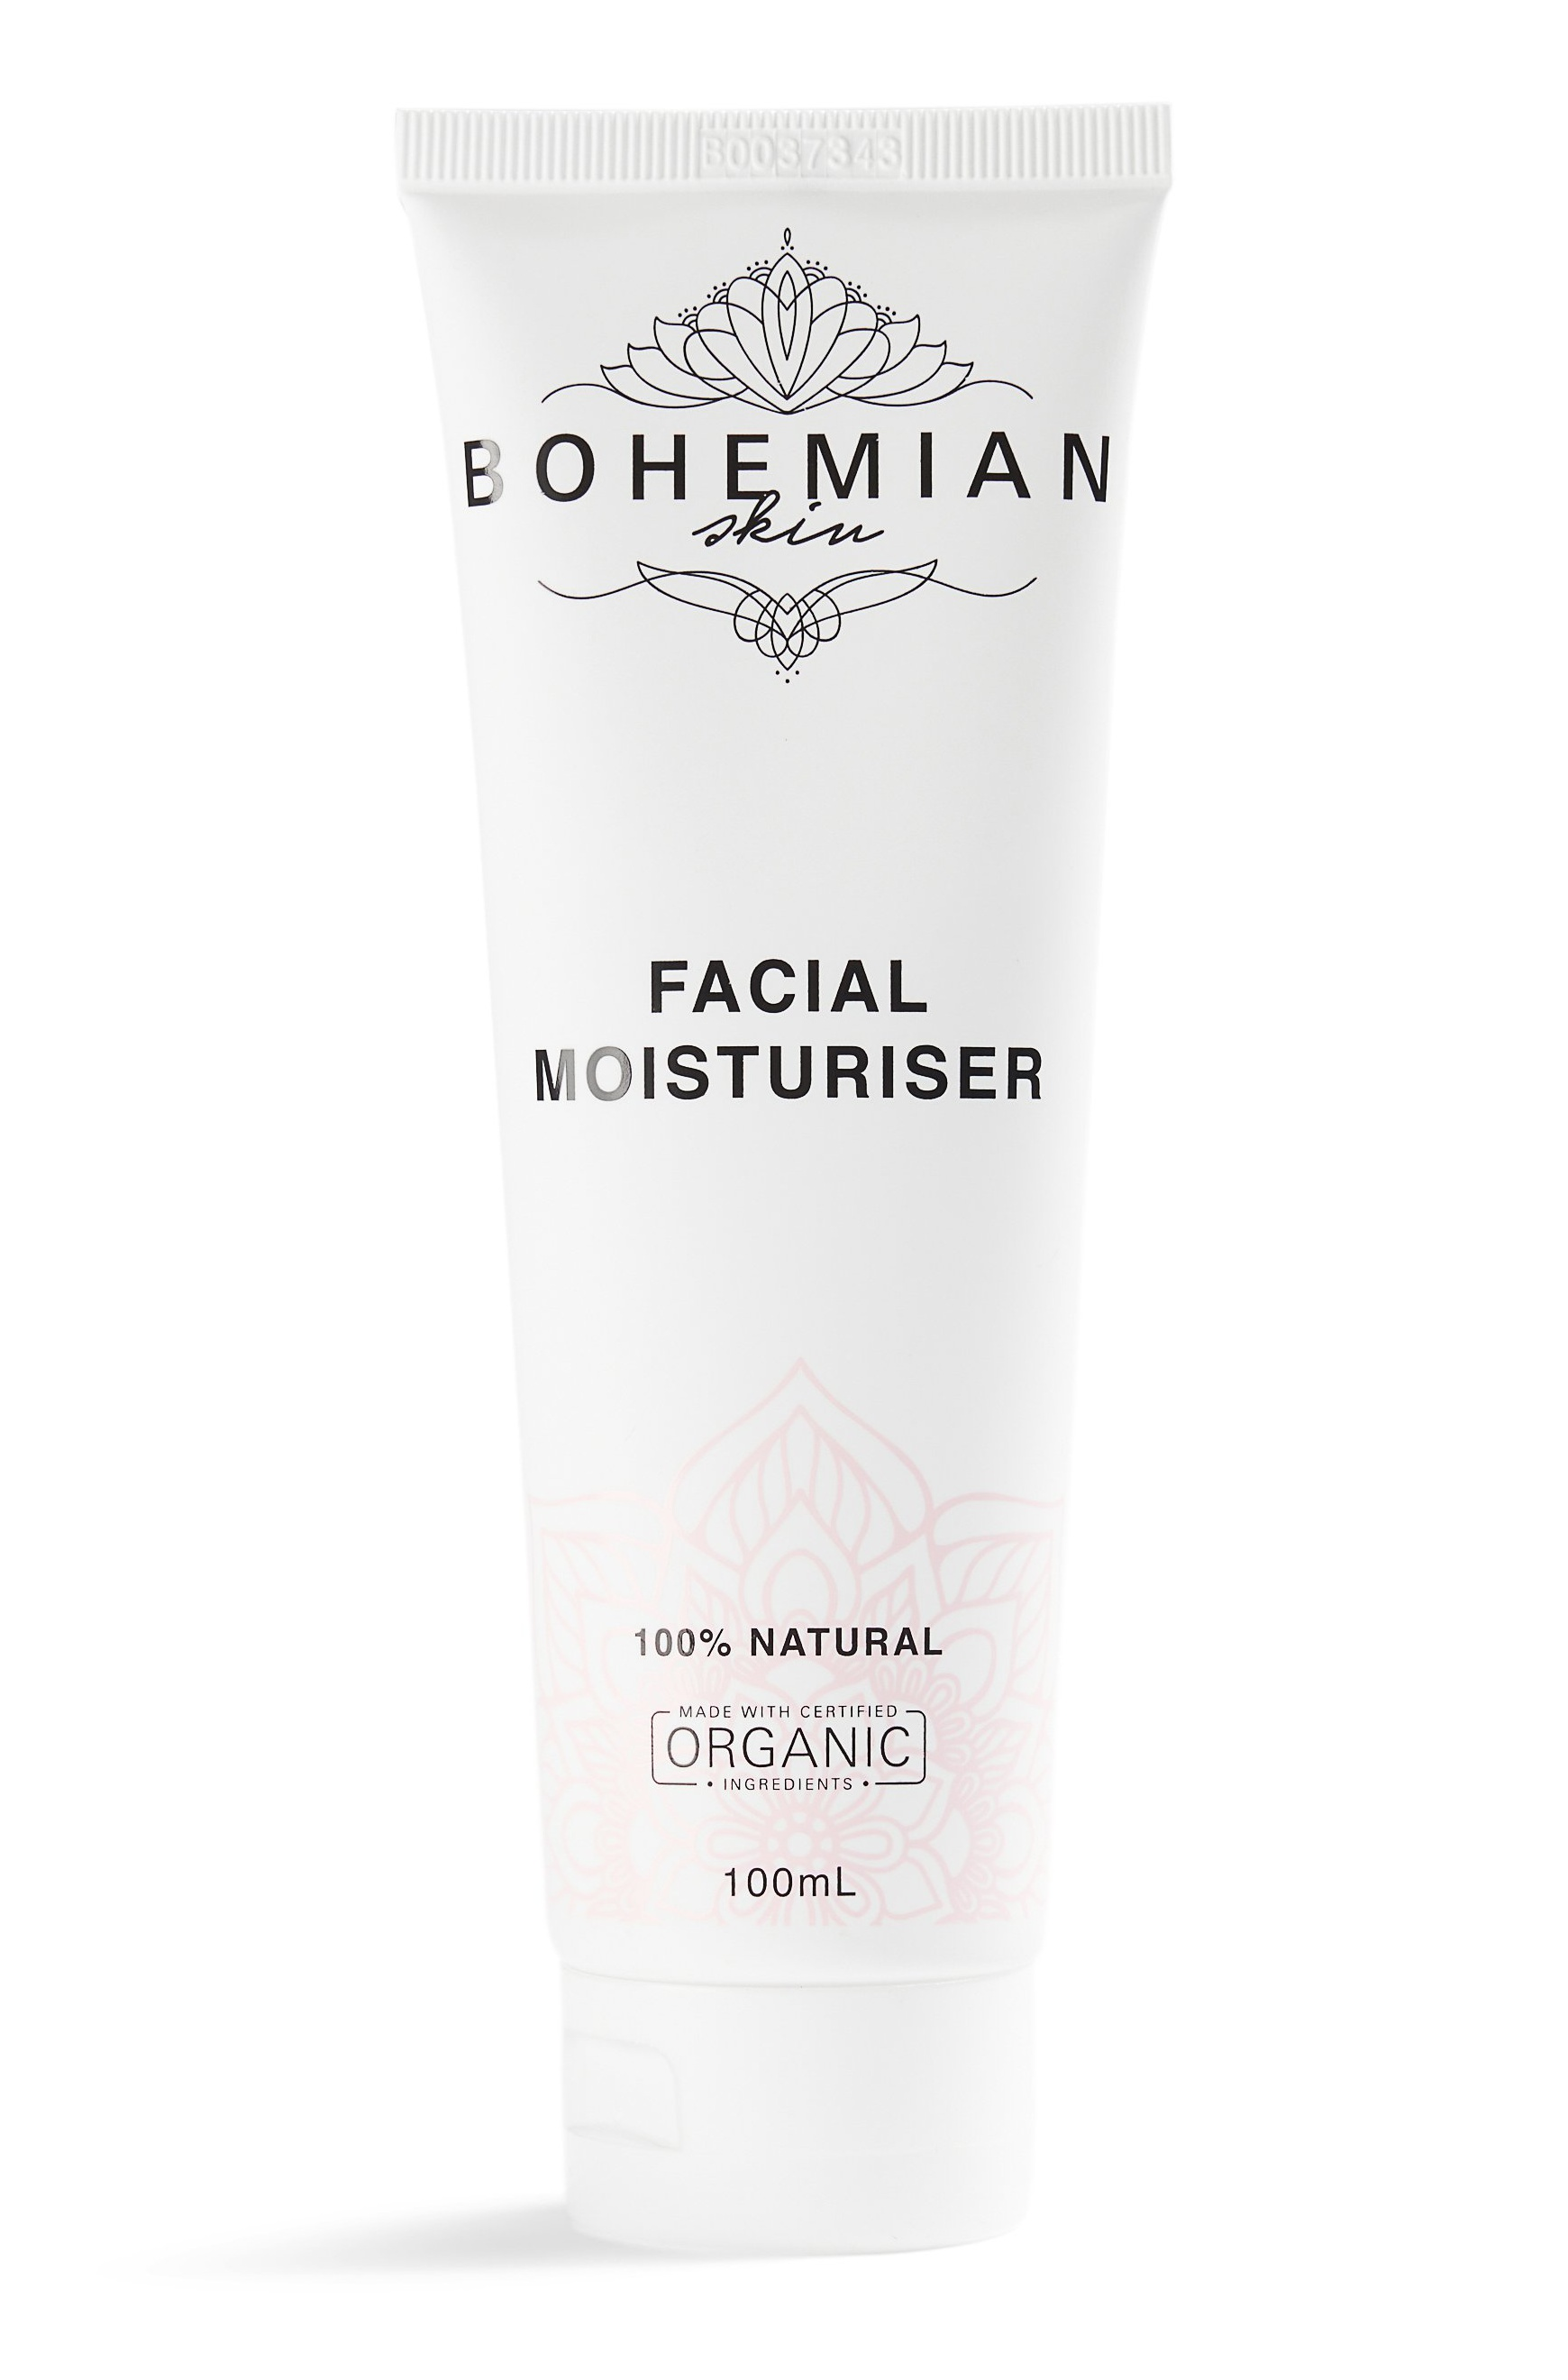 Bohemian skin Facial Moisturiser